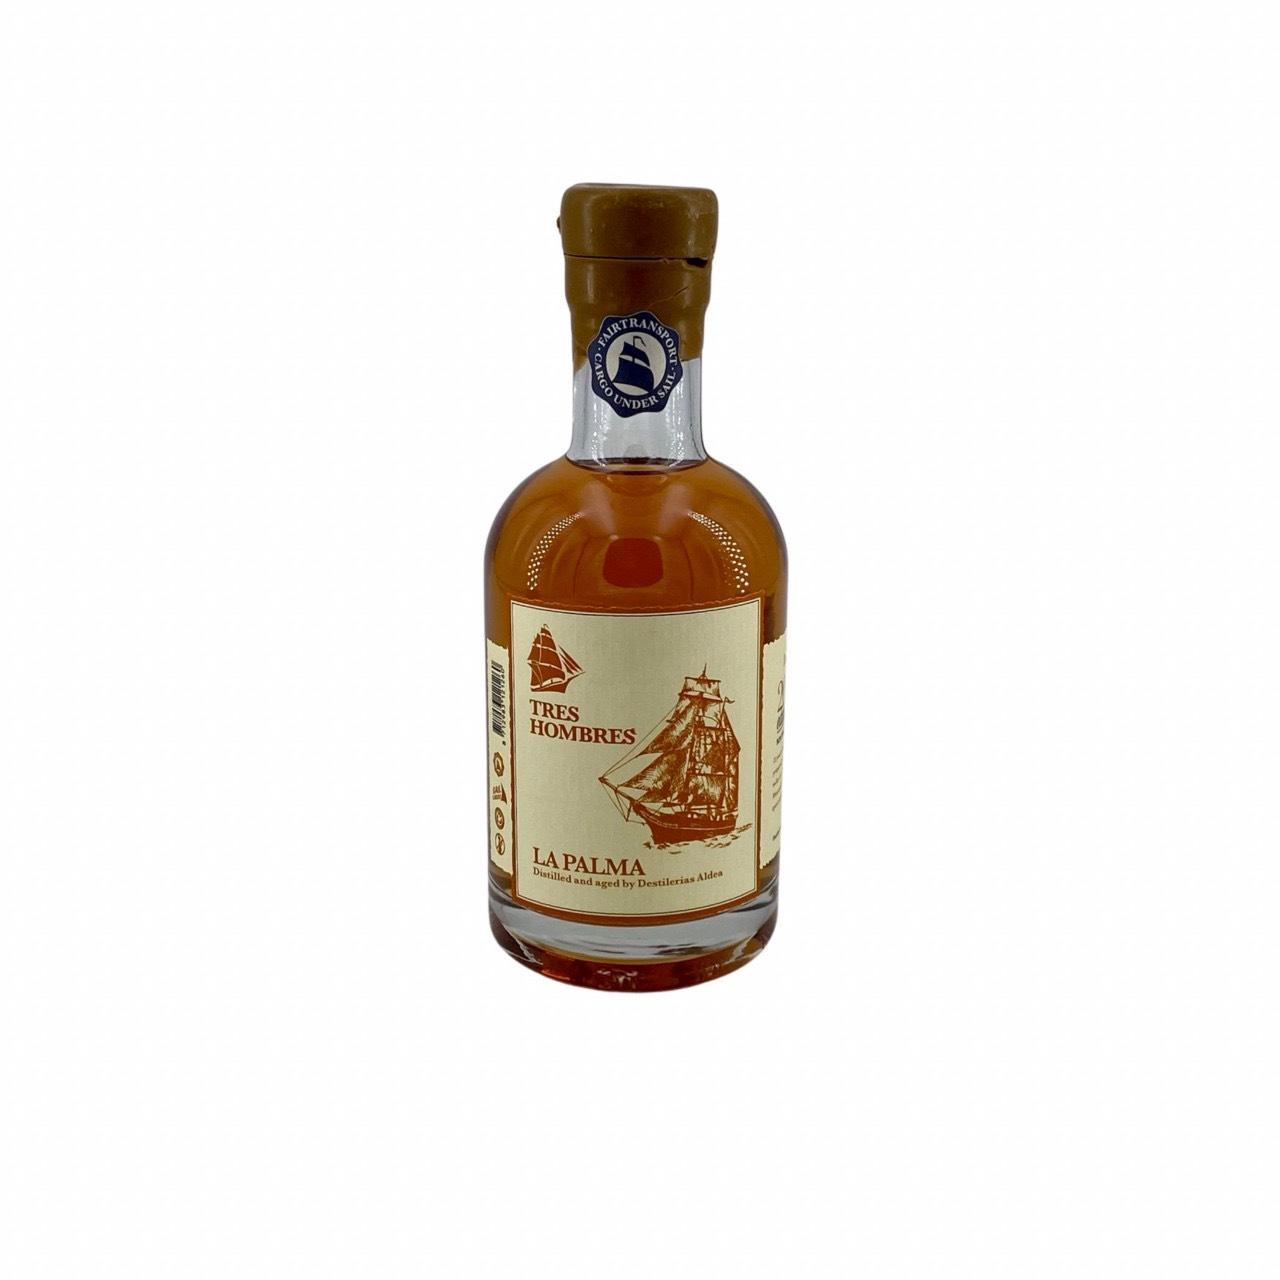 Bottle image of Ed. 37 La Palma Quince